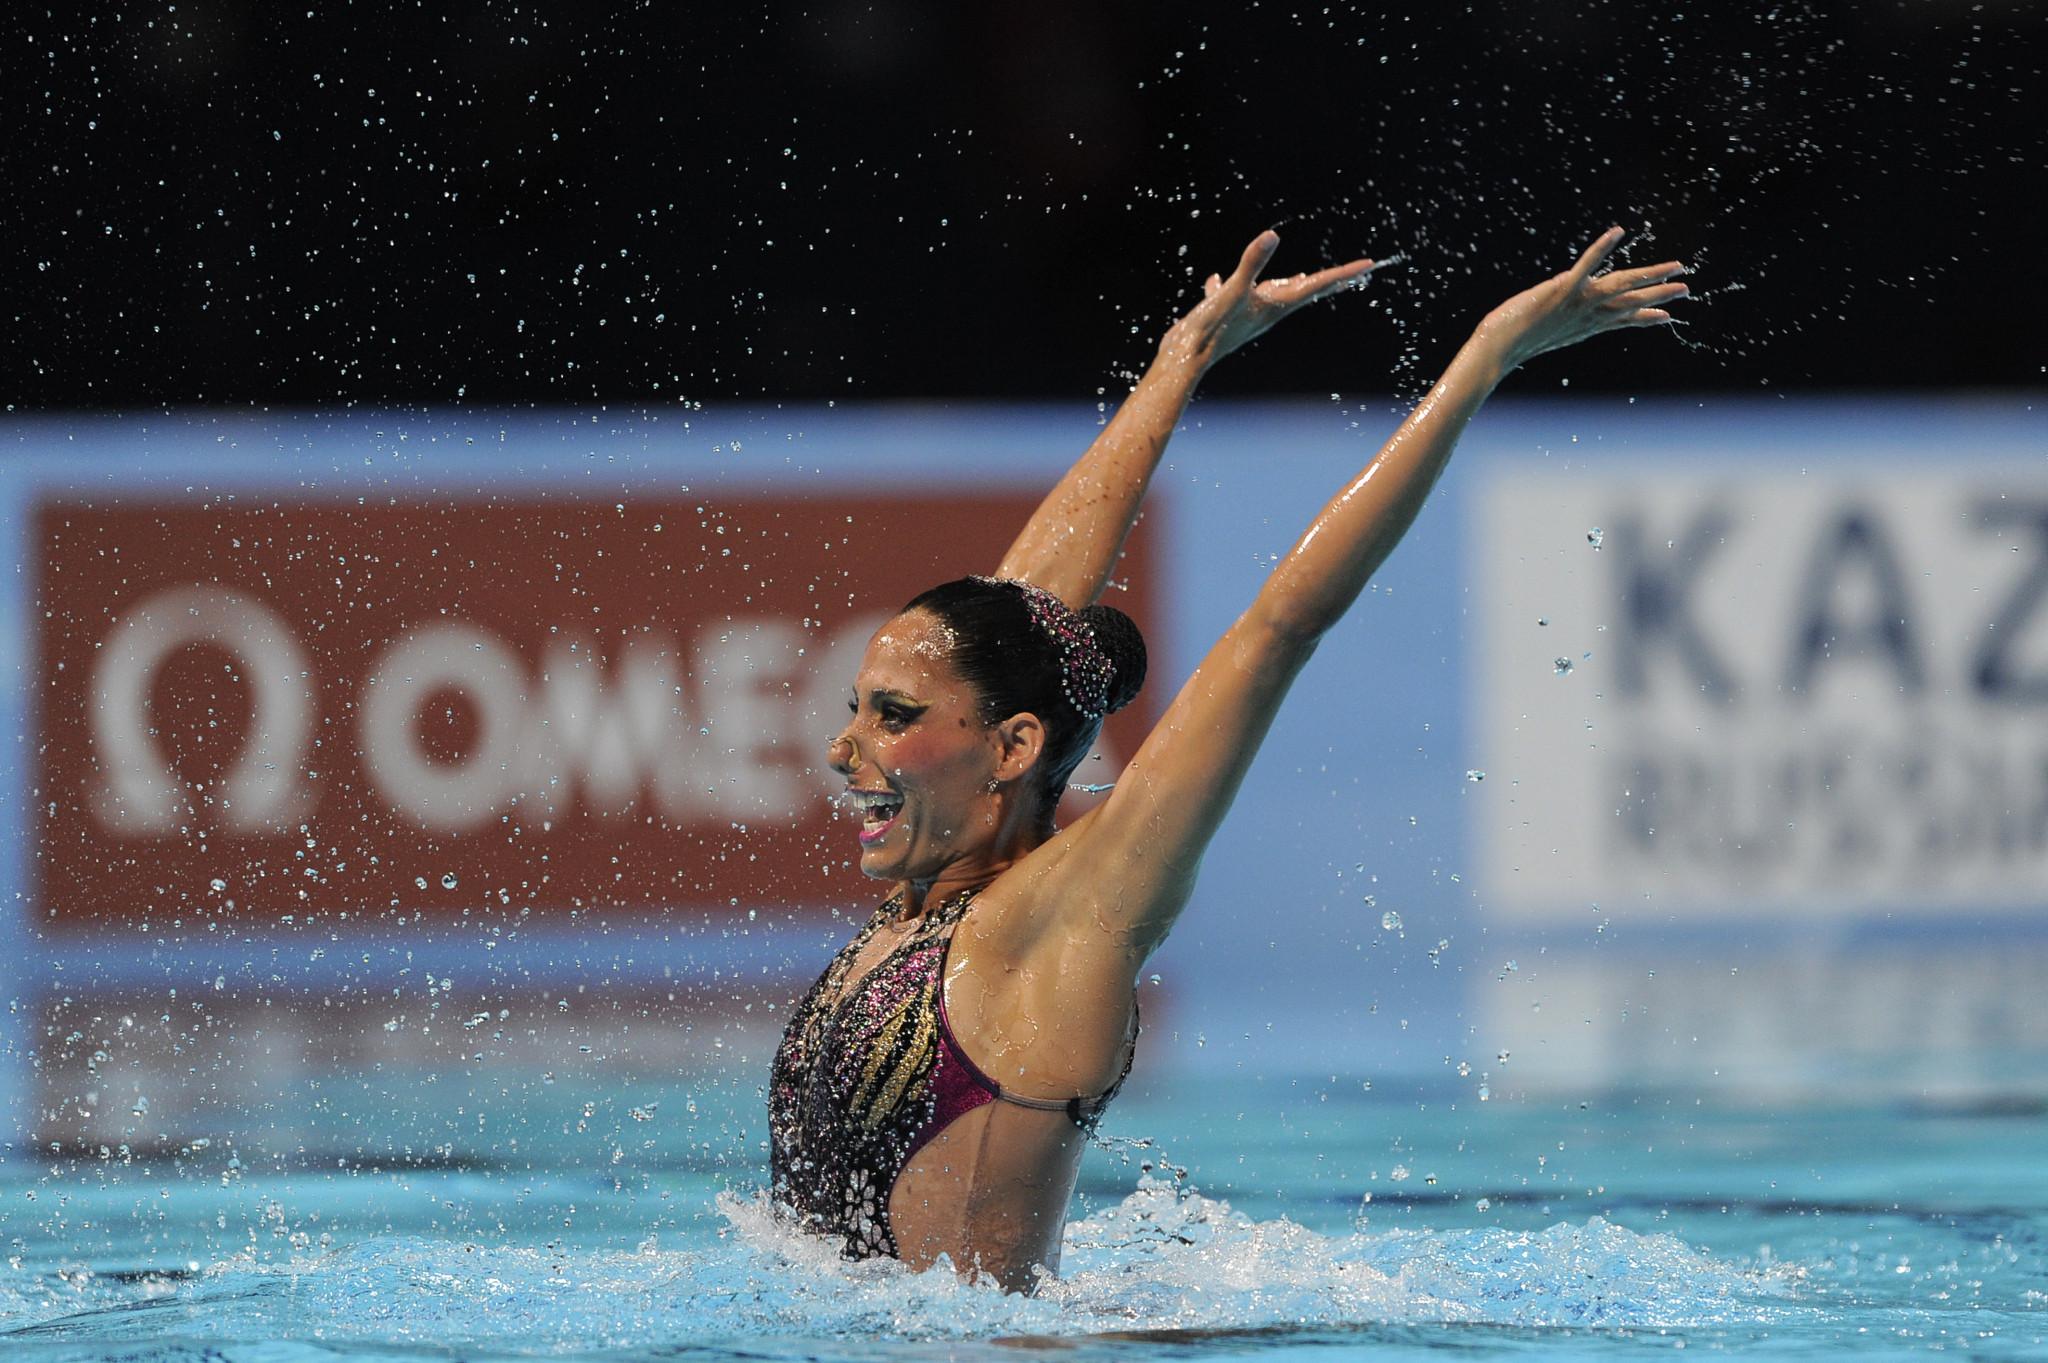 Mexico's Nuria Diosdado Garcia won the solo free routine event ©Getty Images